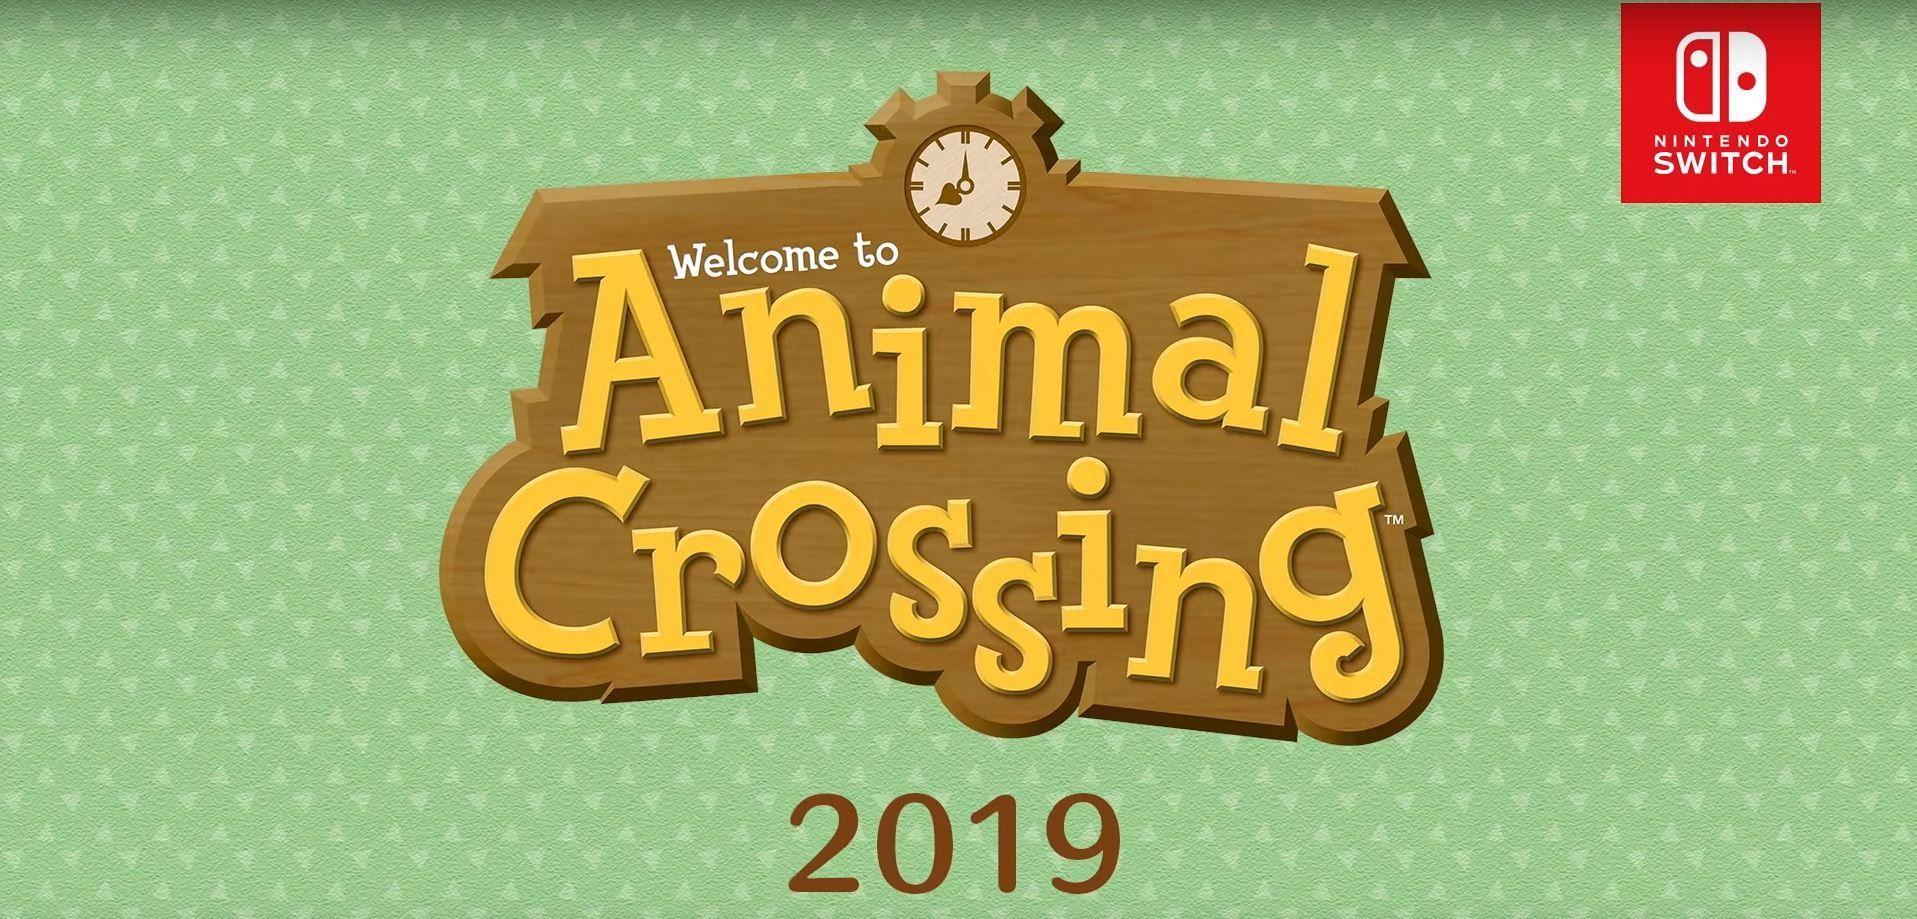 animal crossing 2019 img 1